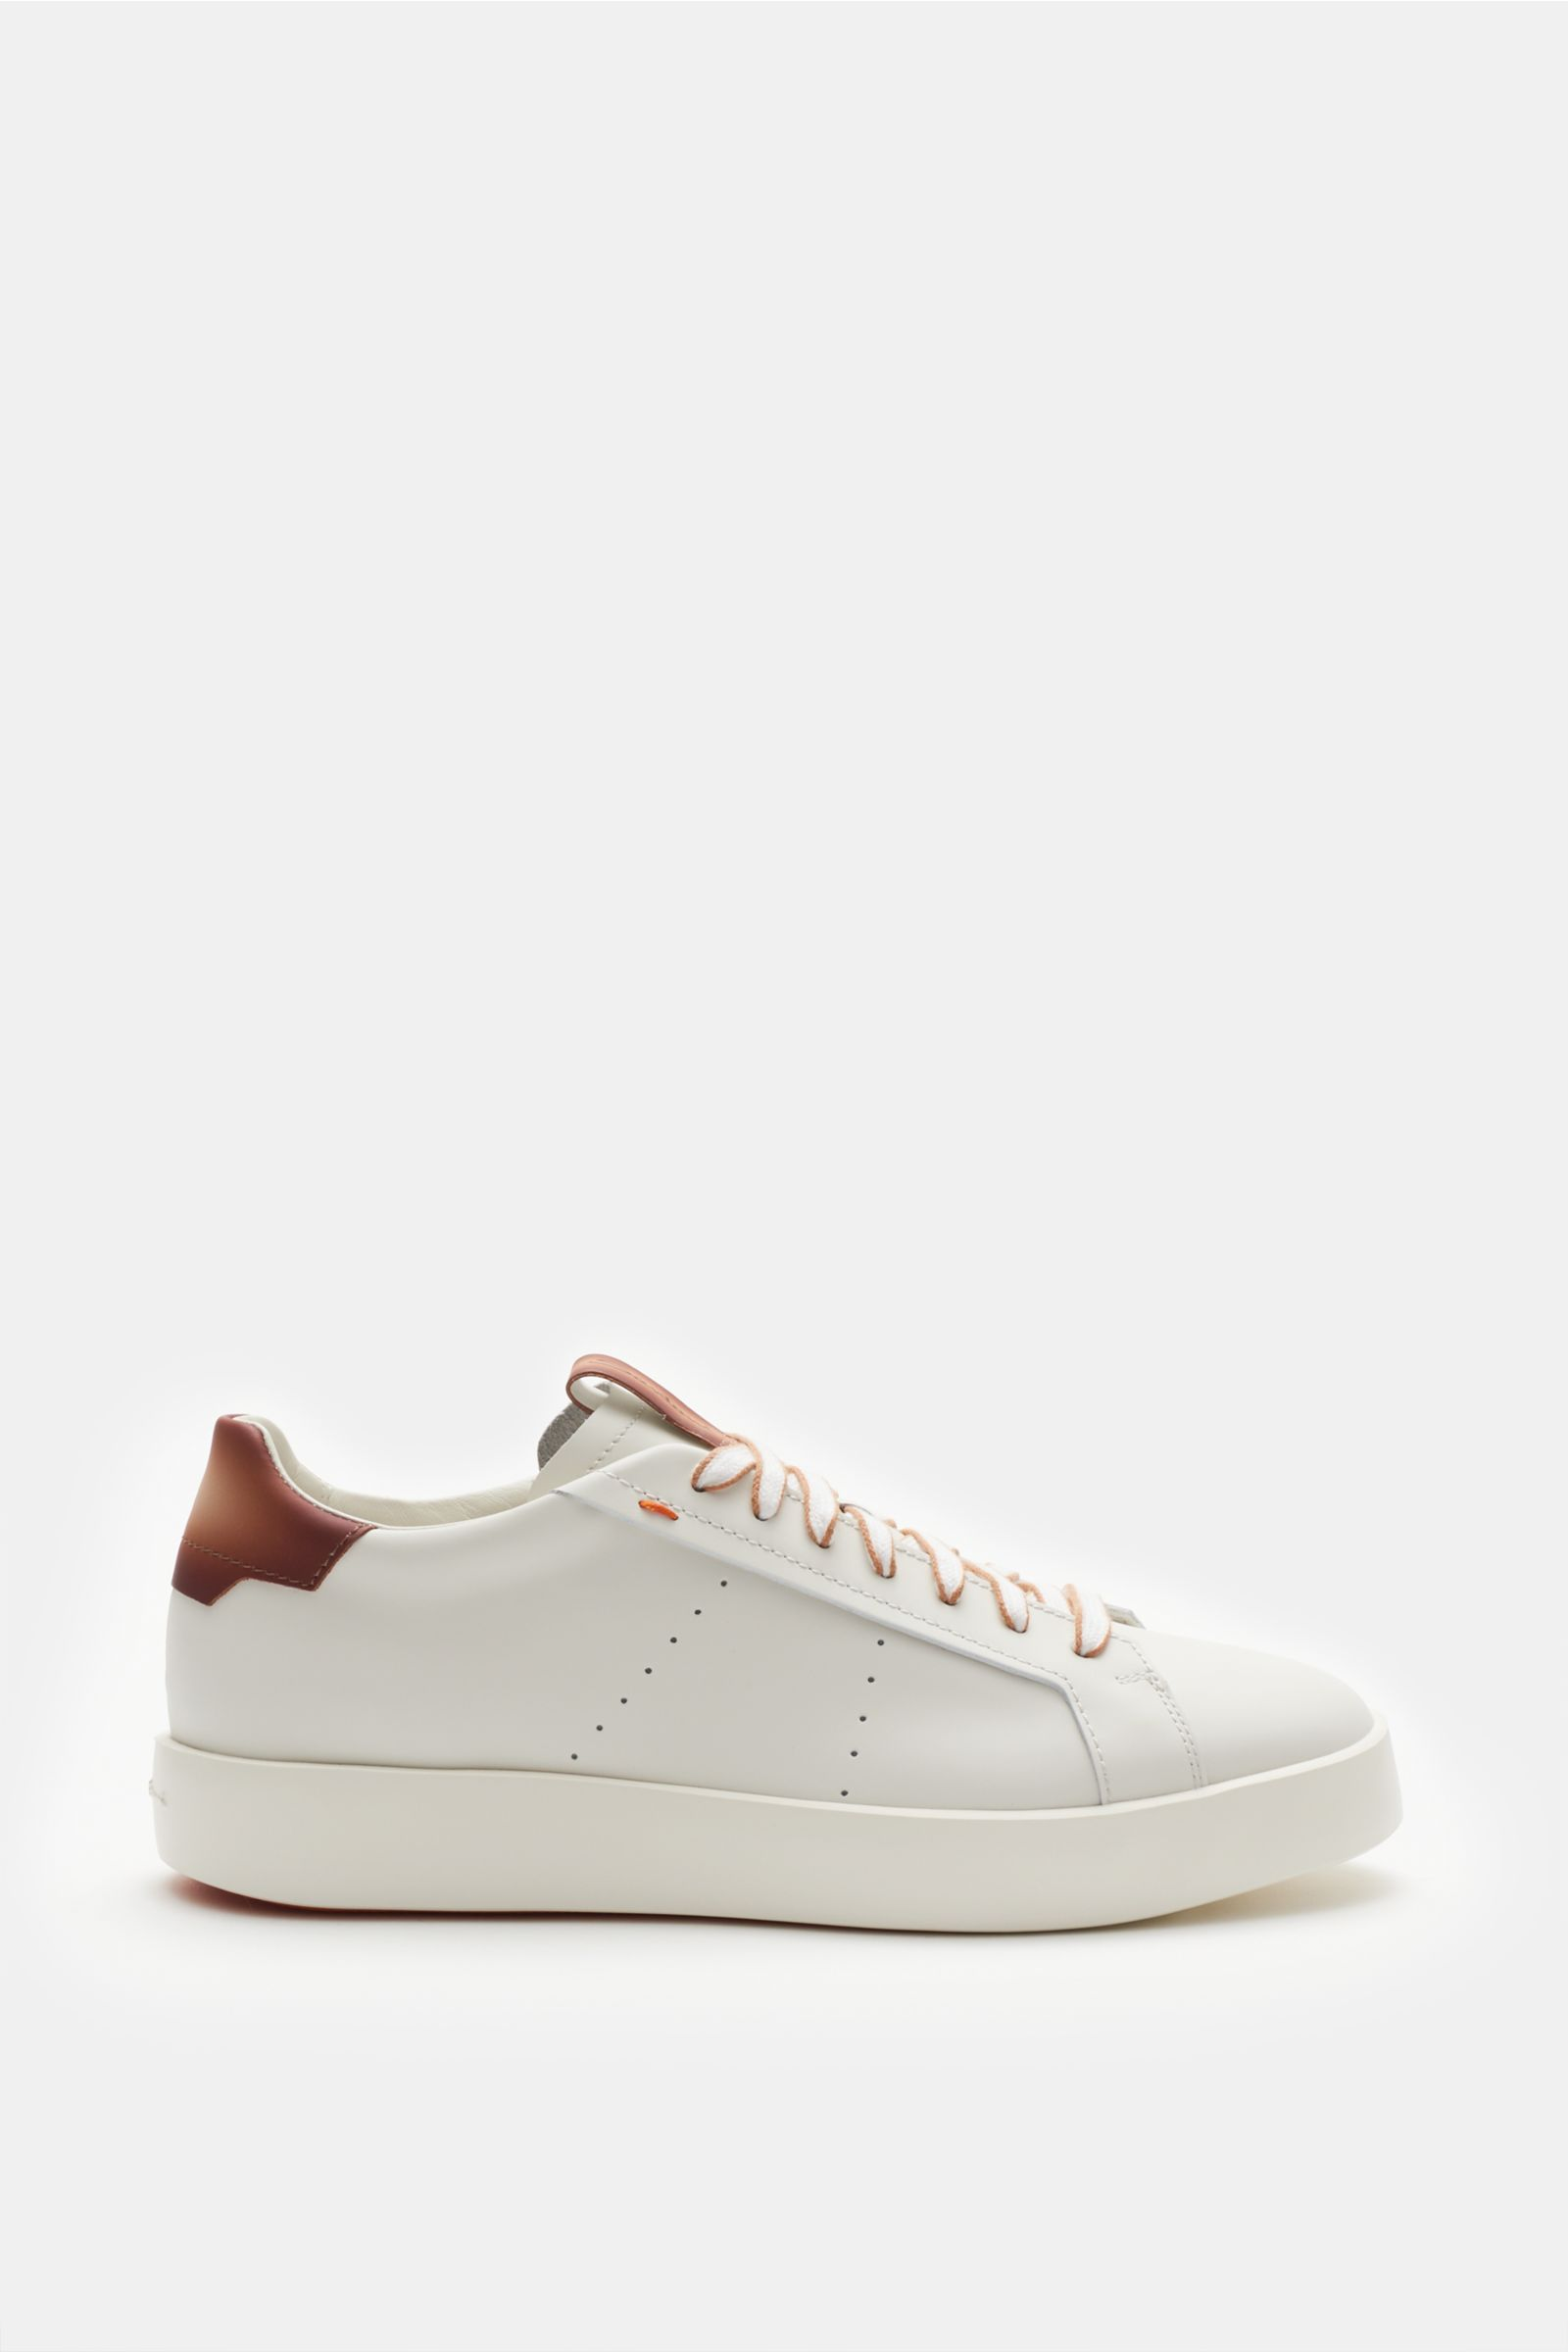 Sneaker weiß/braun